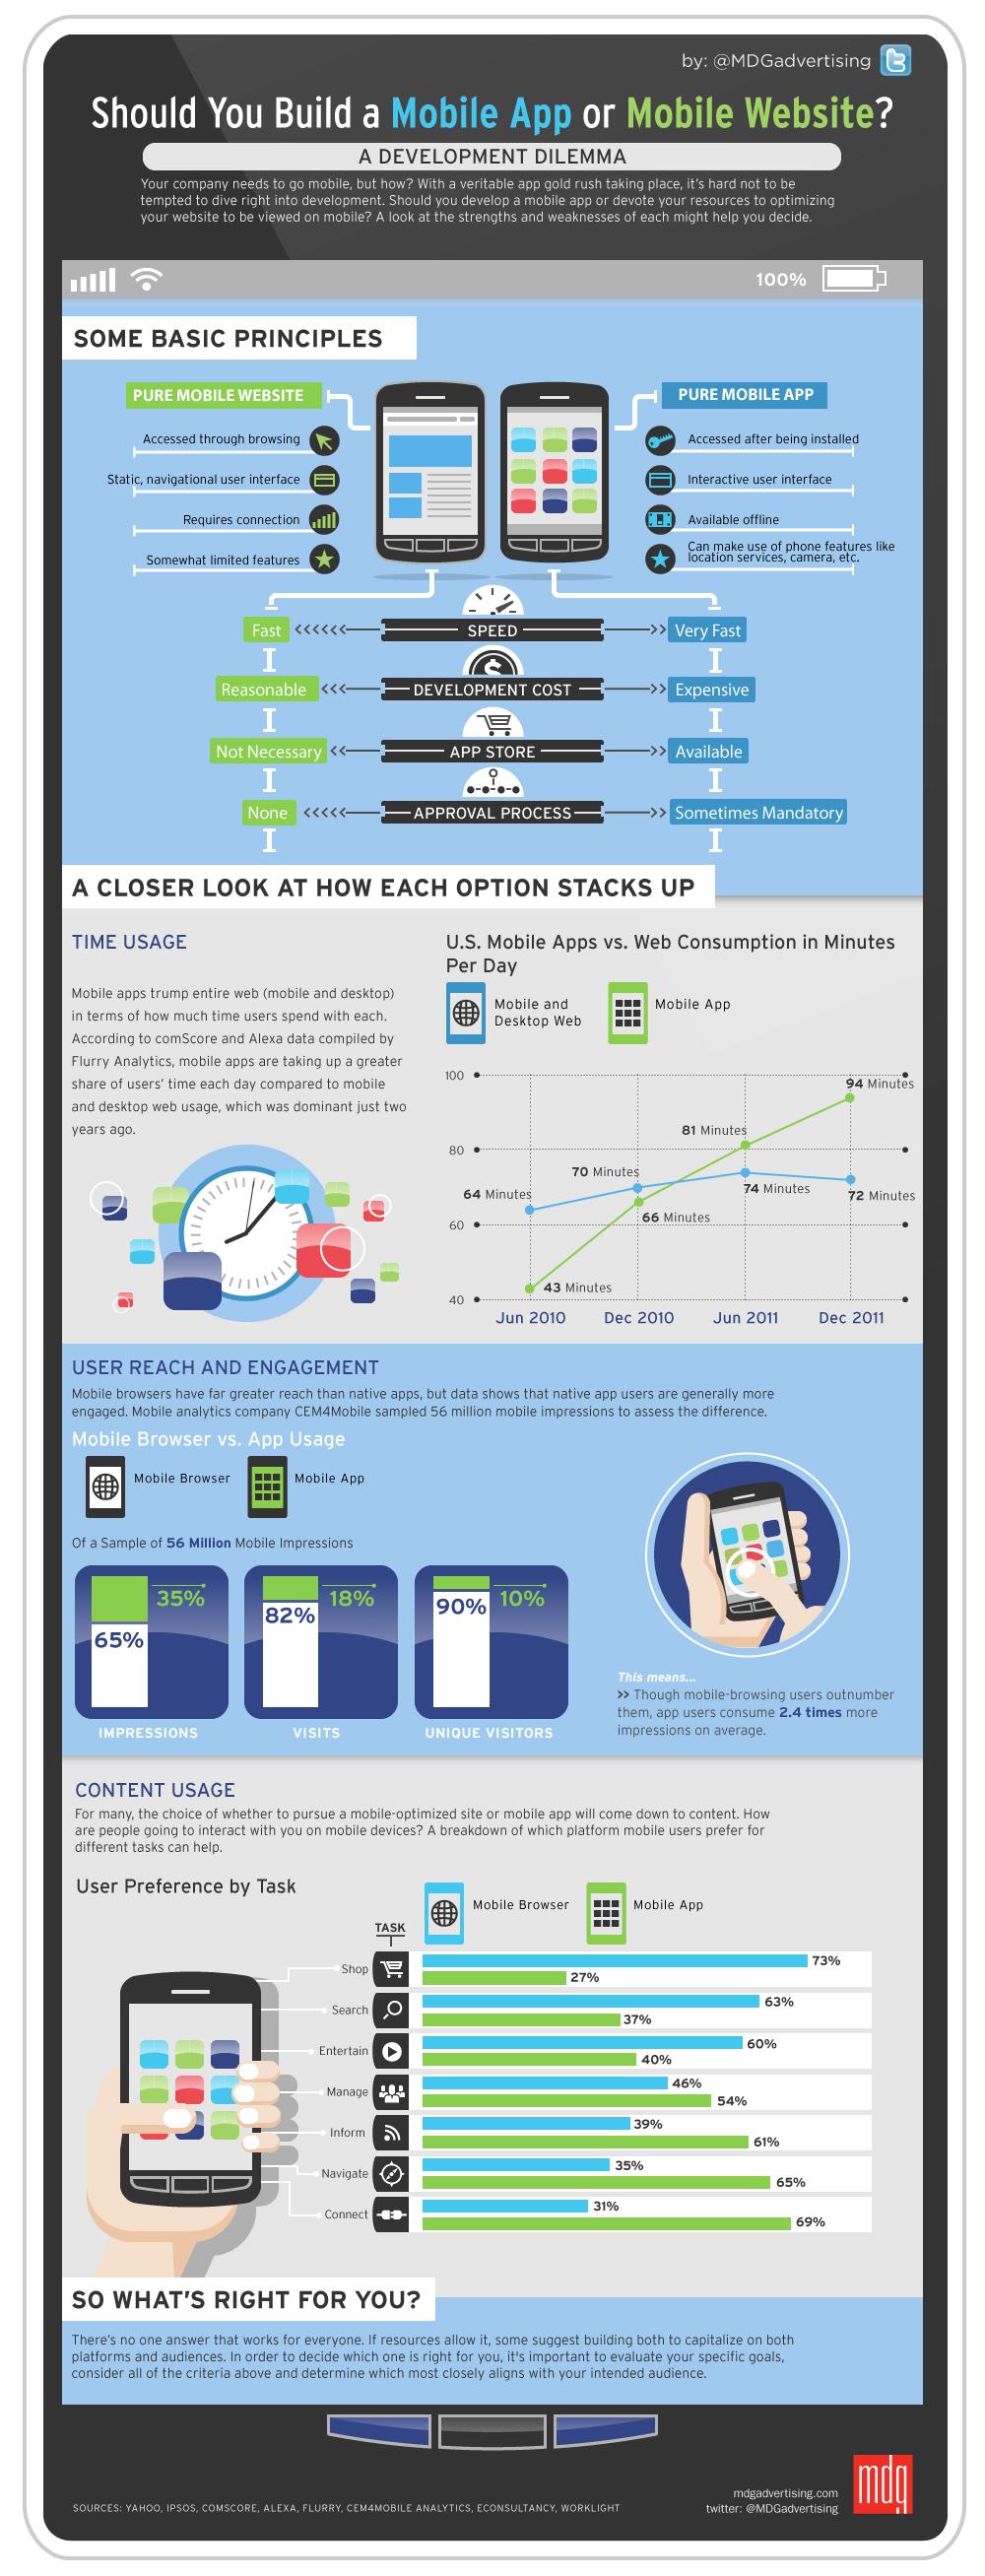 should-you-build-a-mobile-app-or-mobile-website